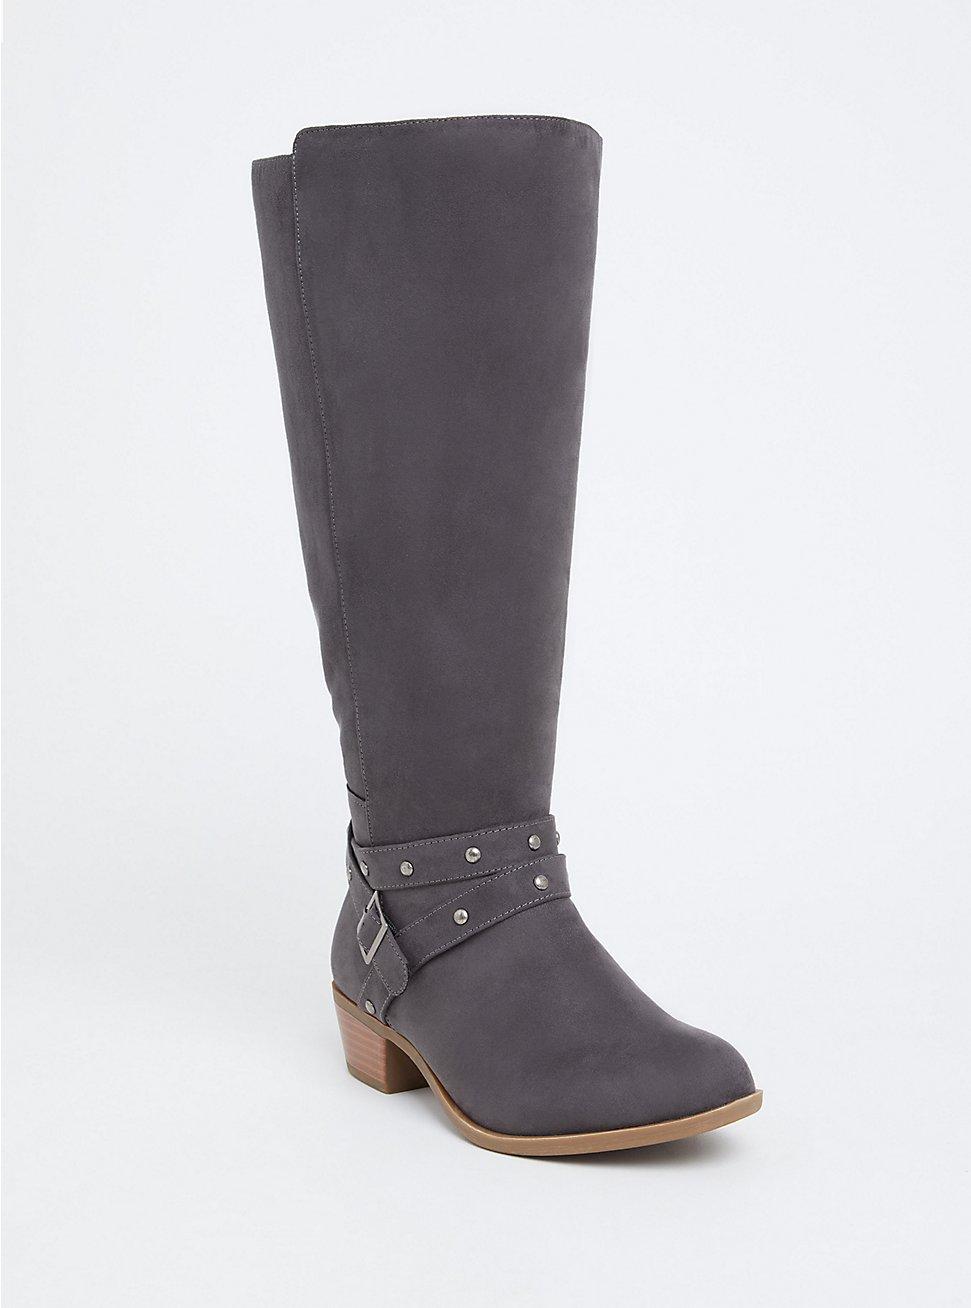 Dark Grey Faux Suede Studded Strap Knee-High Boot (WW), GREY, hi-res